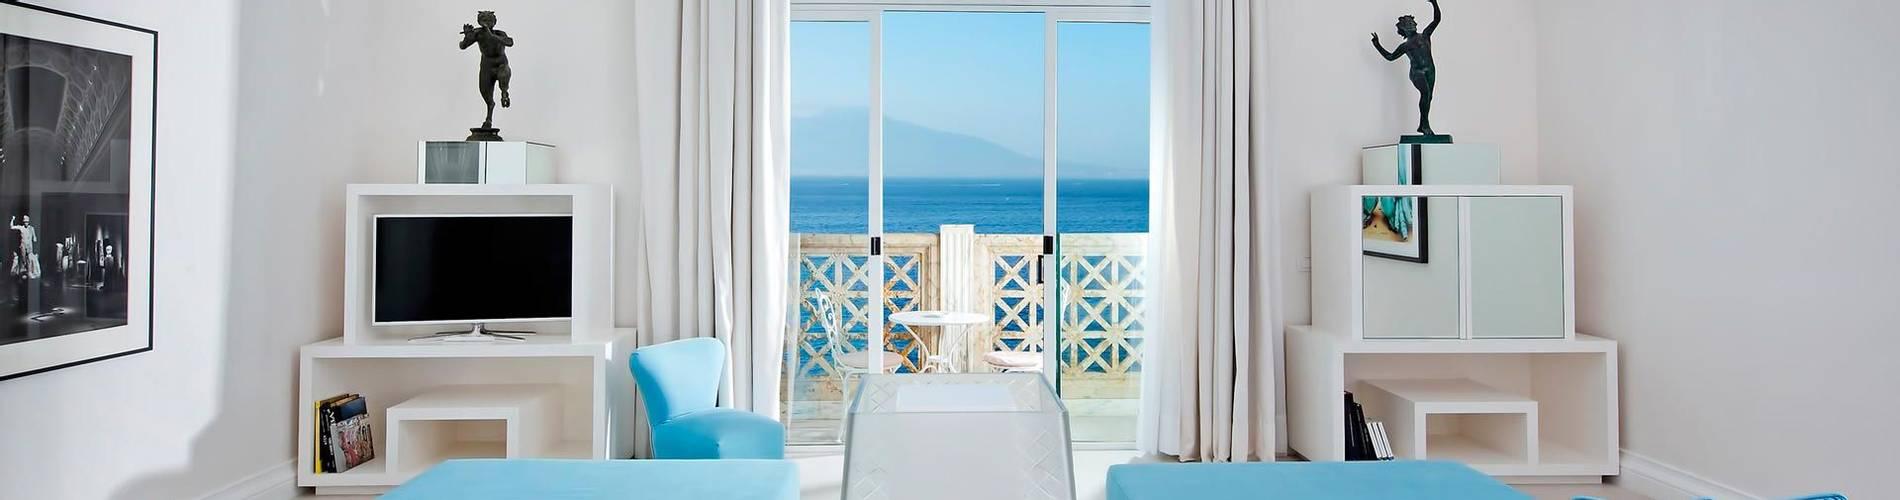 Bellevue Syrene, Sorrento, Italy, De La Syrene Suite (4).jpg